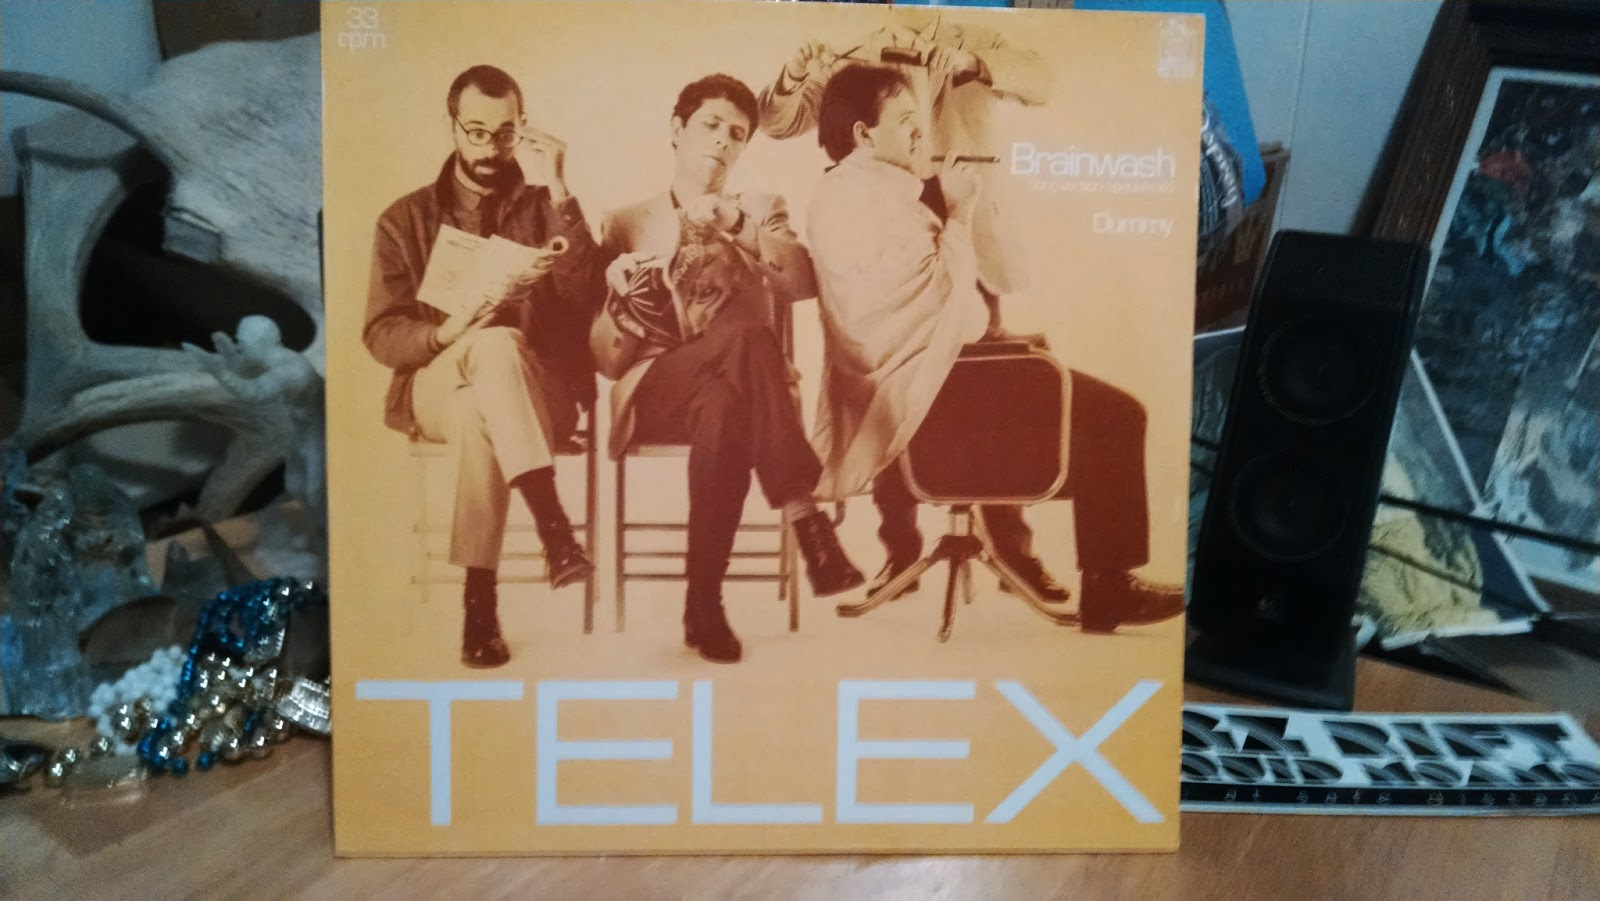 Telex Brainwash Long Version Special Mix